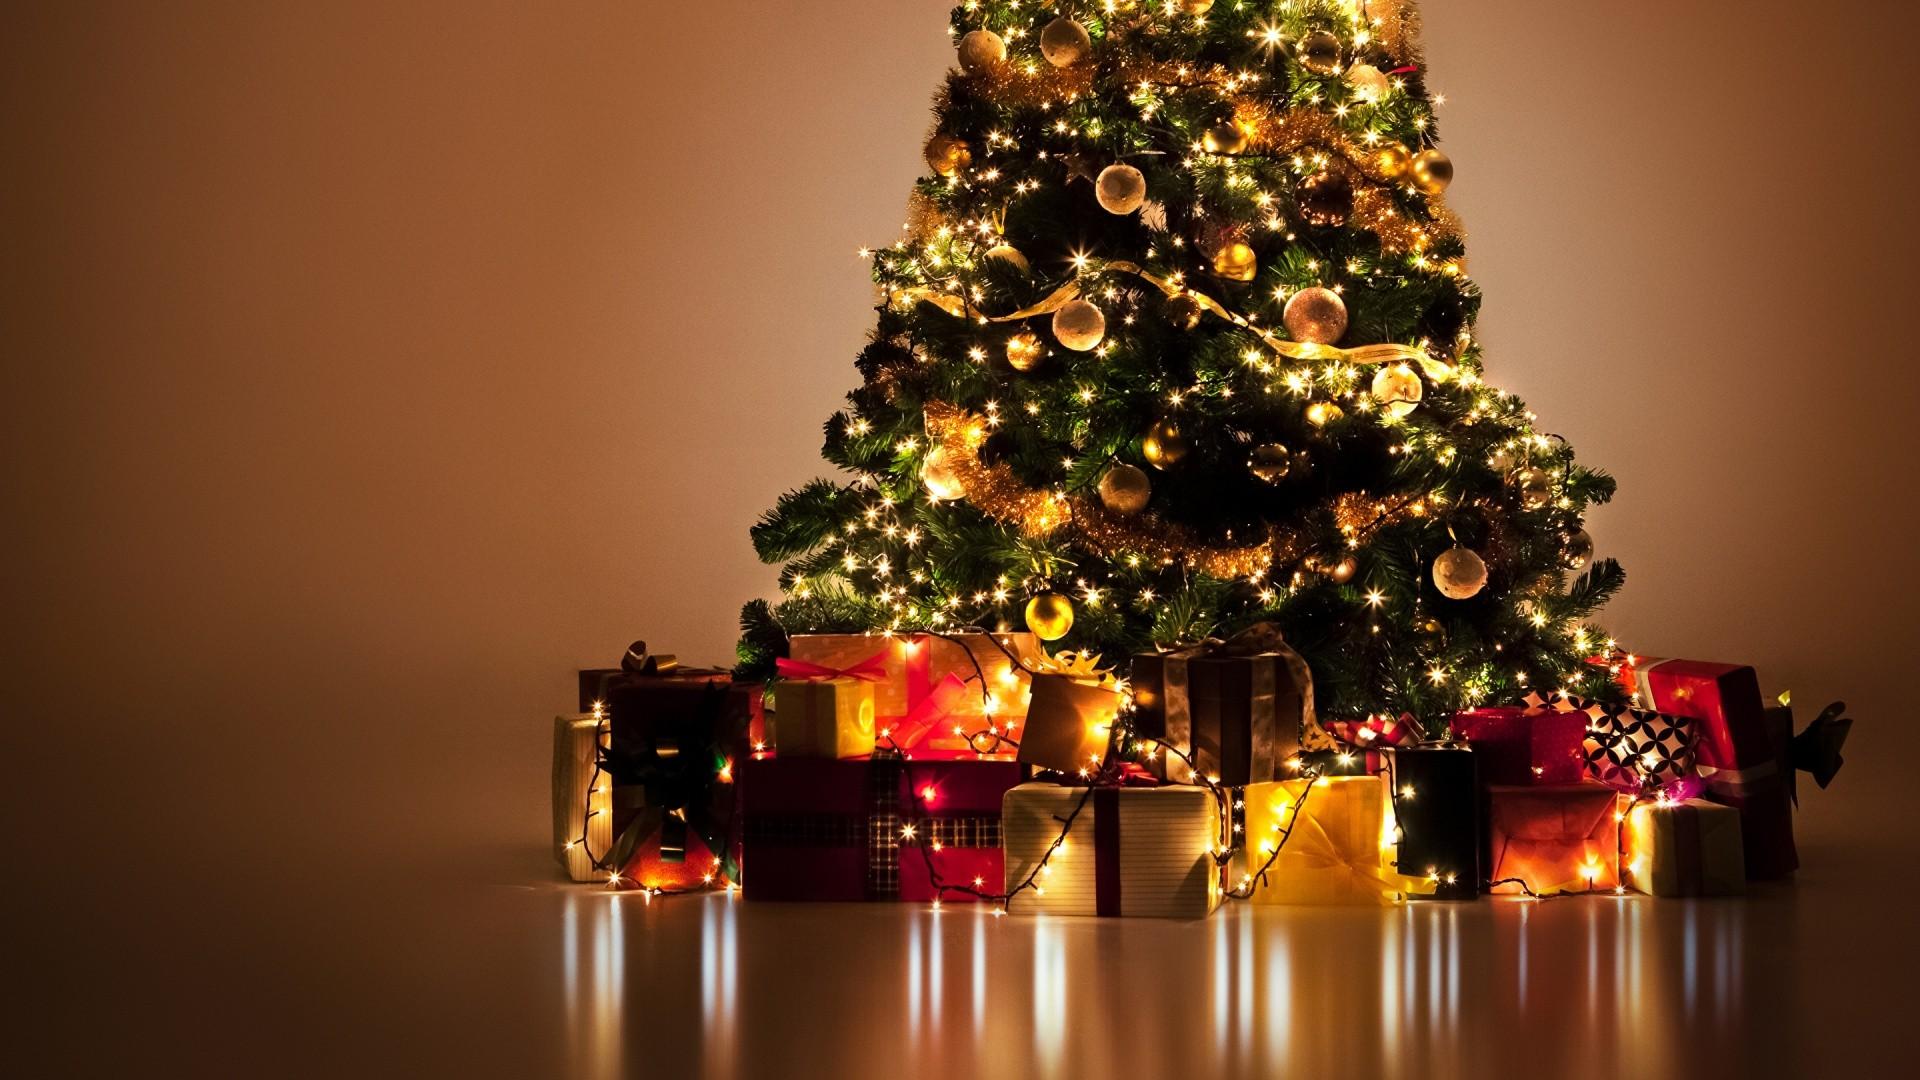 Christmas Tree PC Wallpaper